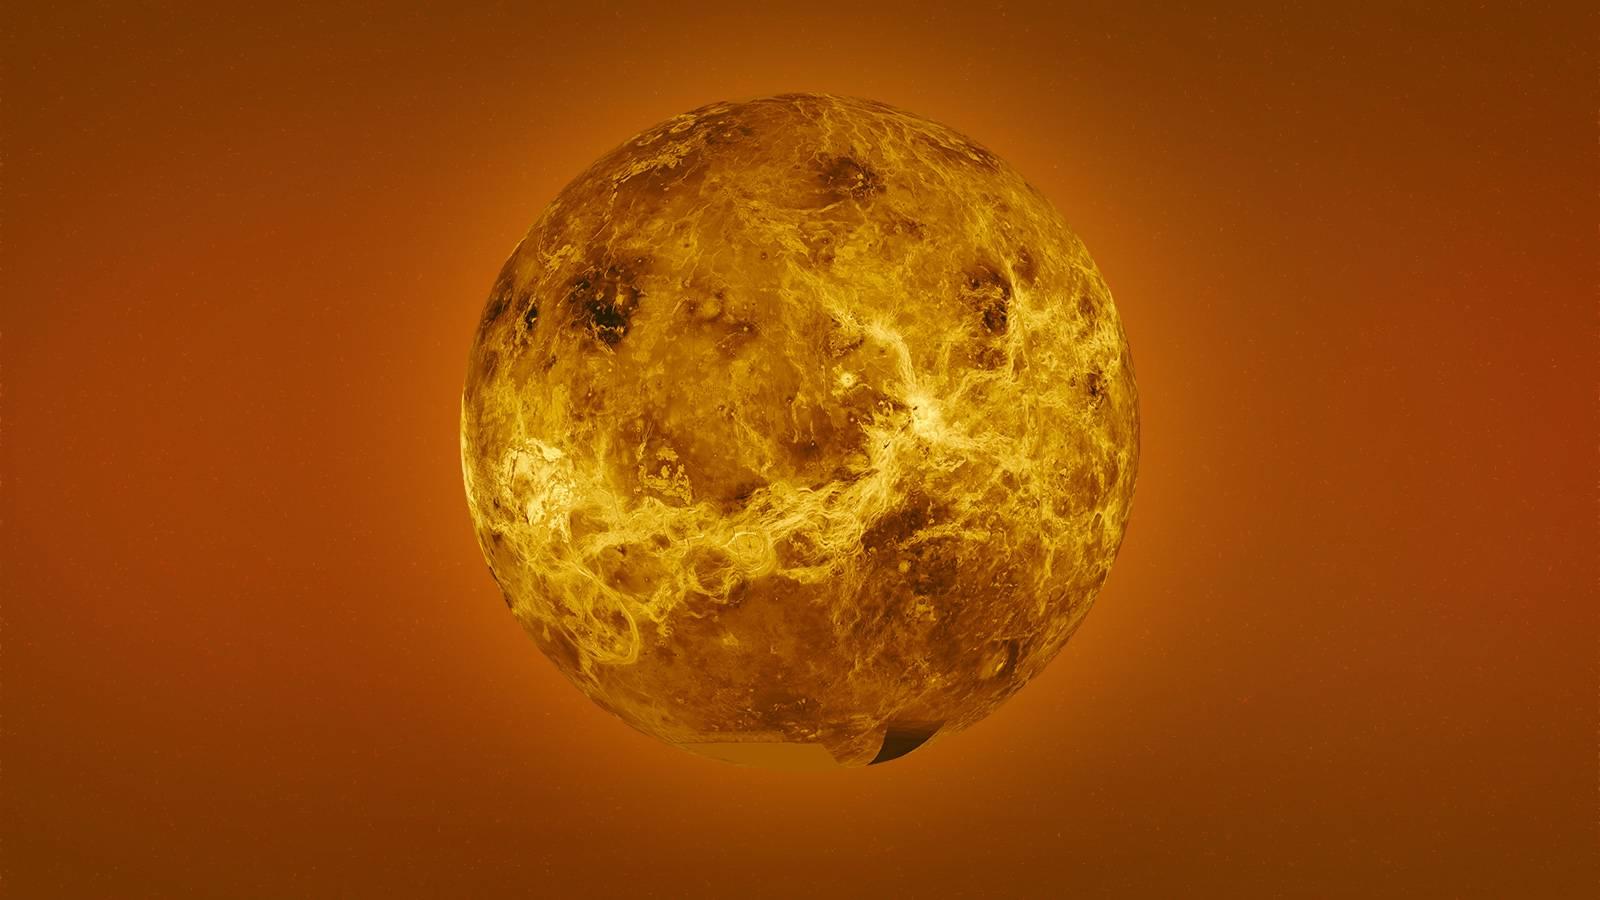 Planeta Venus Descoperire INCREDIBILA care a UIMIT Toata Lumea